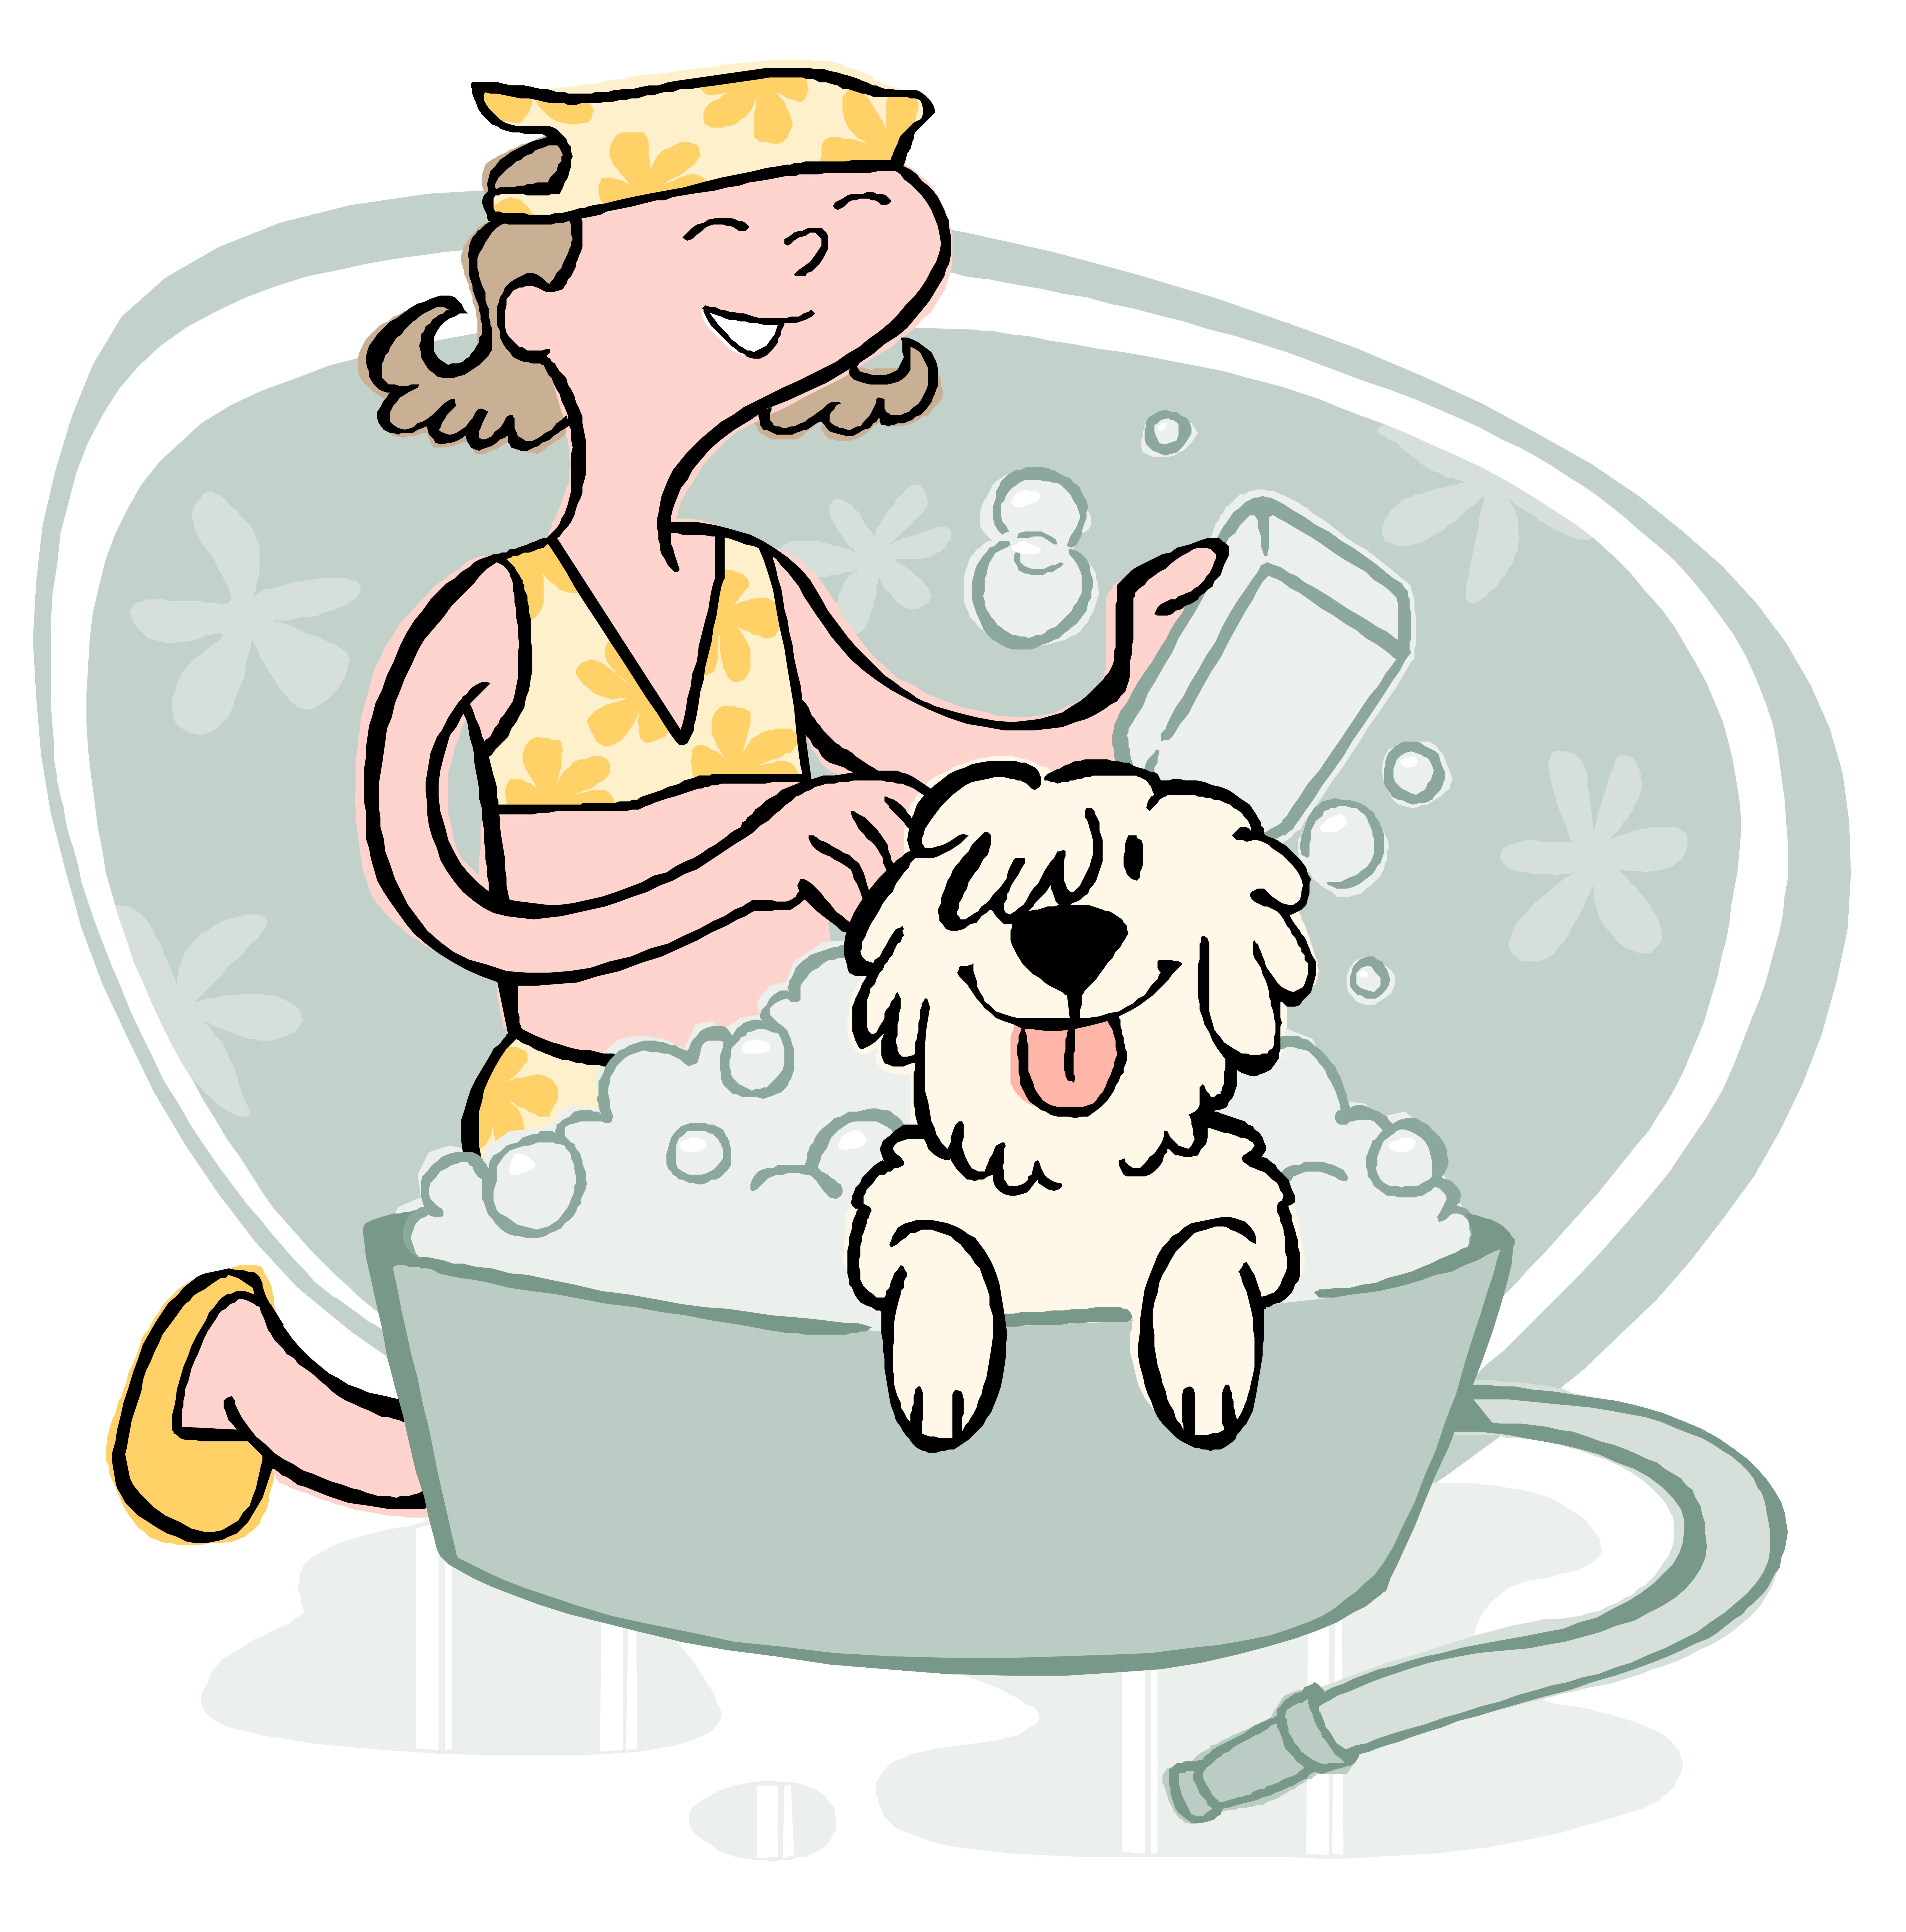 Dog and cat bath clipart clipart transparent stock Dog grooming Cat Puppy Pet - Pet a bath 7010*7104 transprent Png ... clipart transparent stock